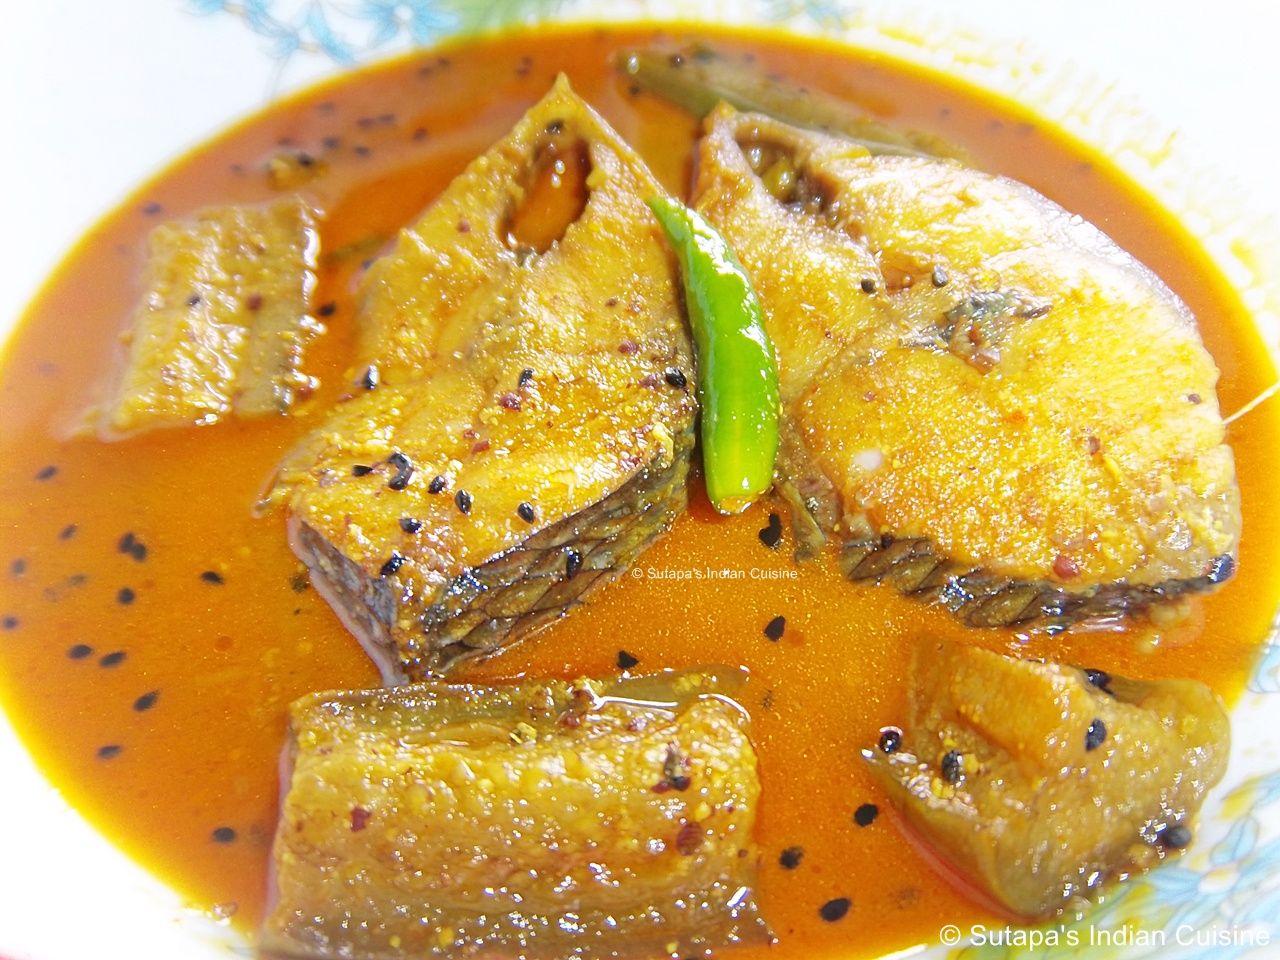 Ilish macher begun jhol hilsha shad curry with eggplant sutapas ilish macher begun jhol hilsha shad curry with eggplant indian fish recipesbengali foodcurryeggplantsnom forumfinder Image collections